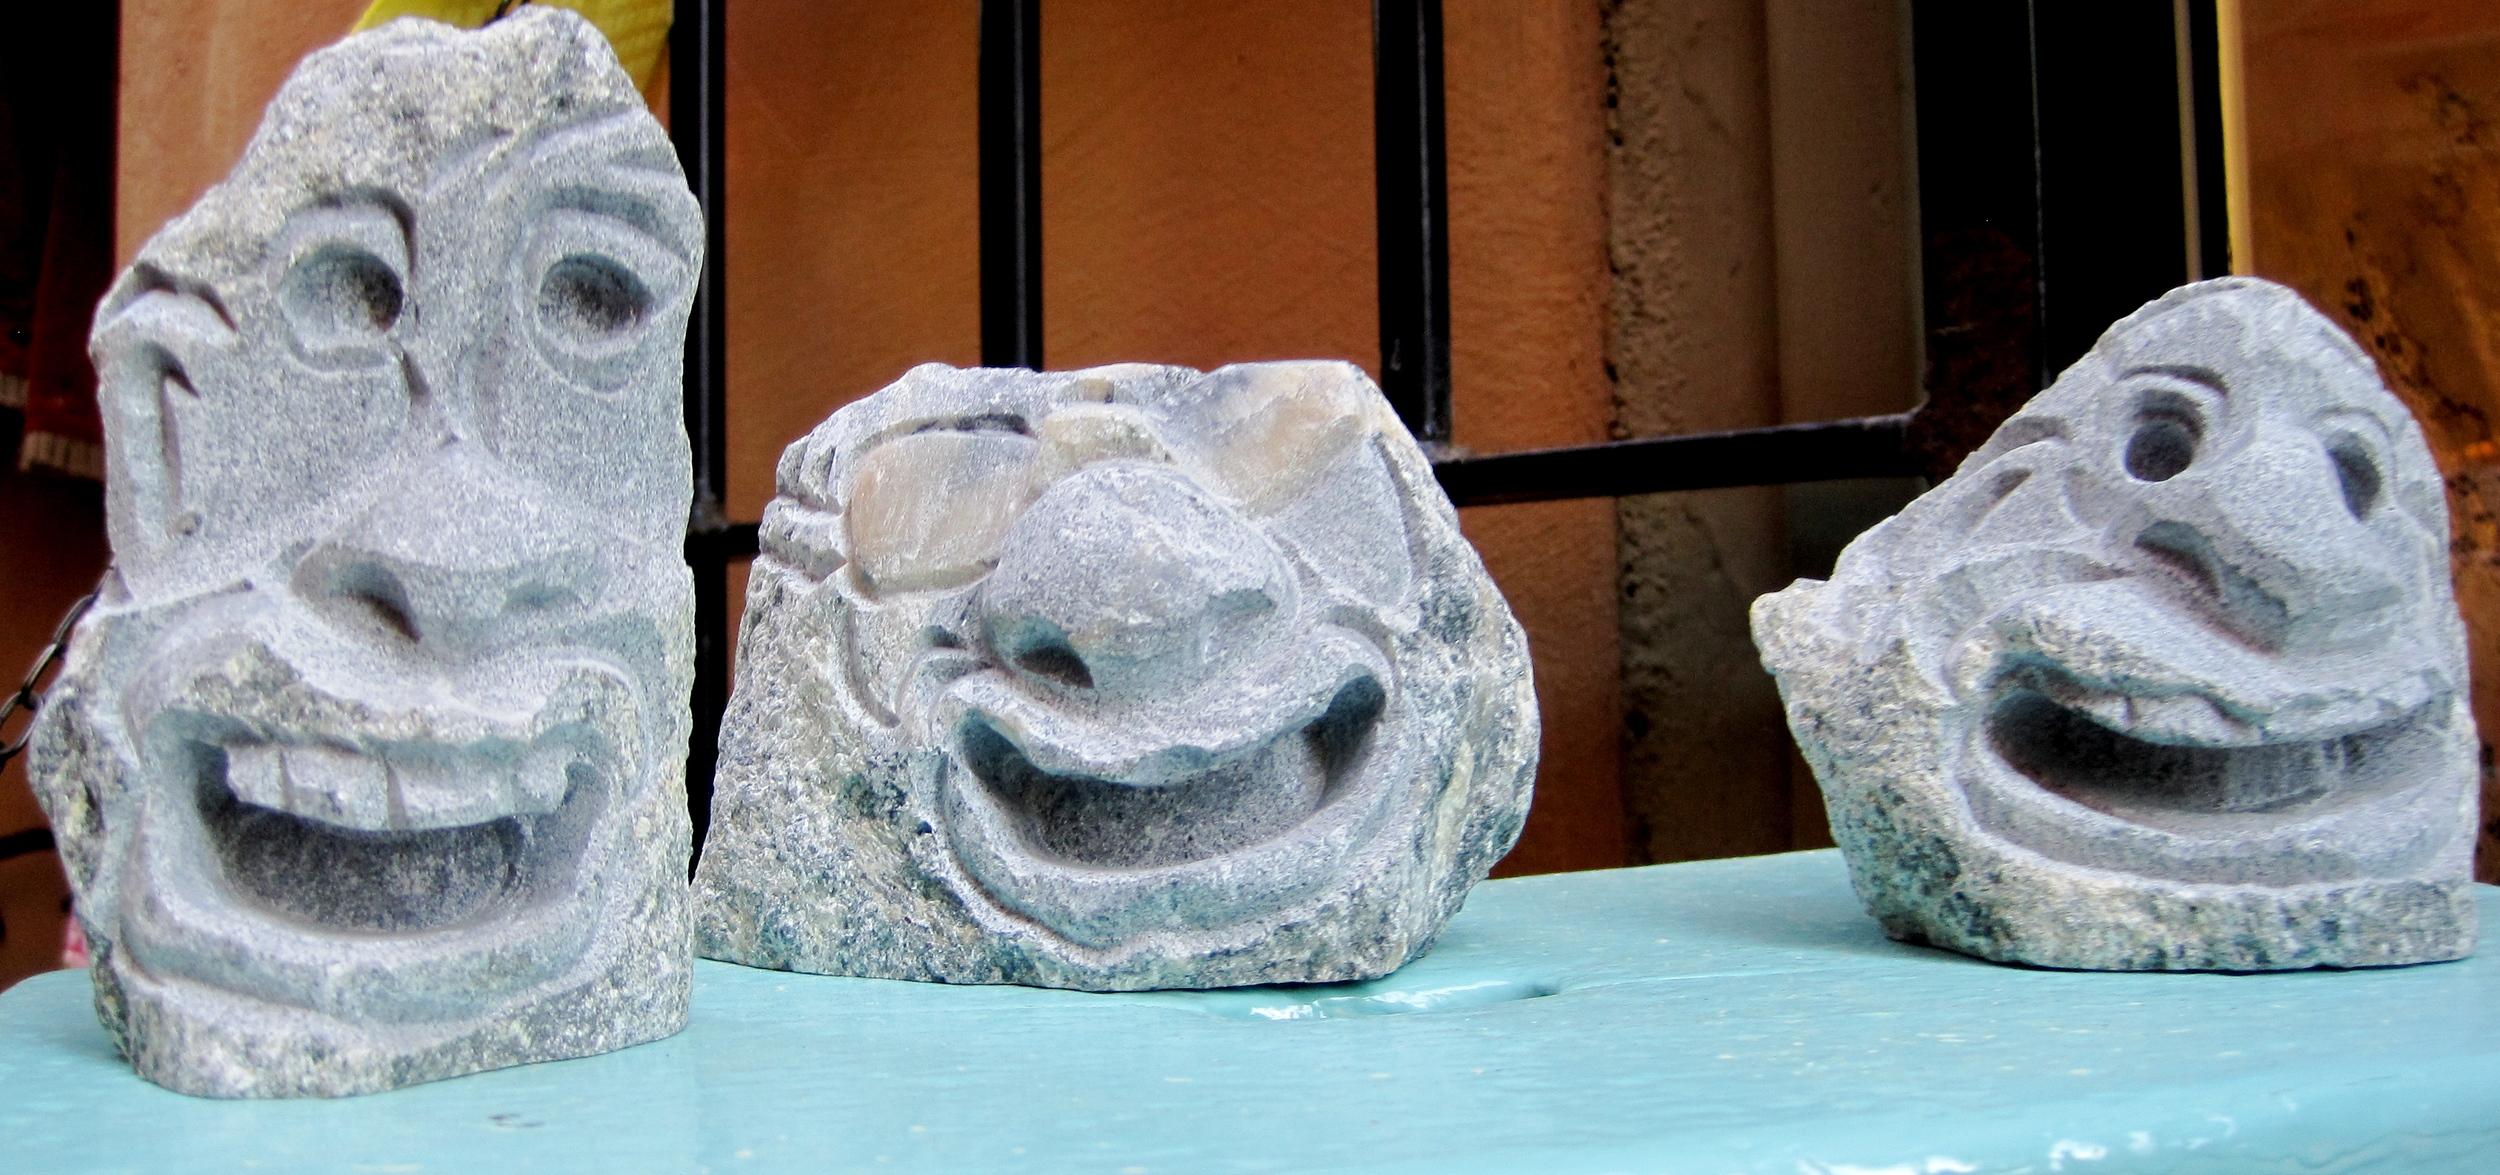 Smiling rocks.JPG